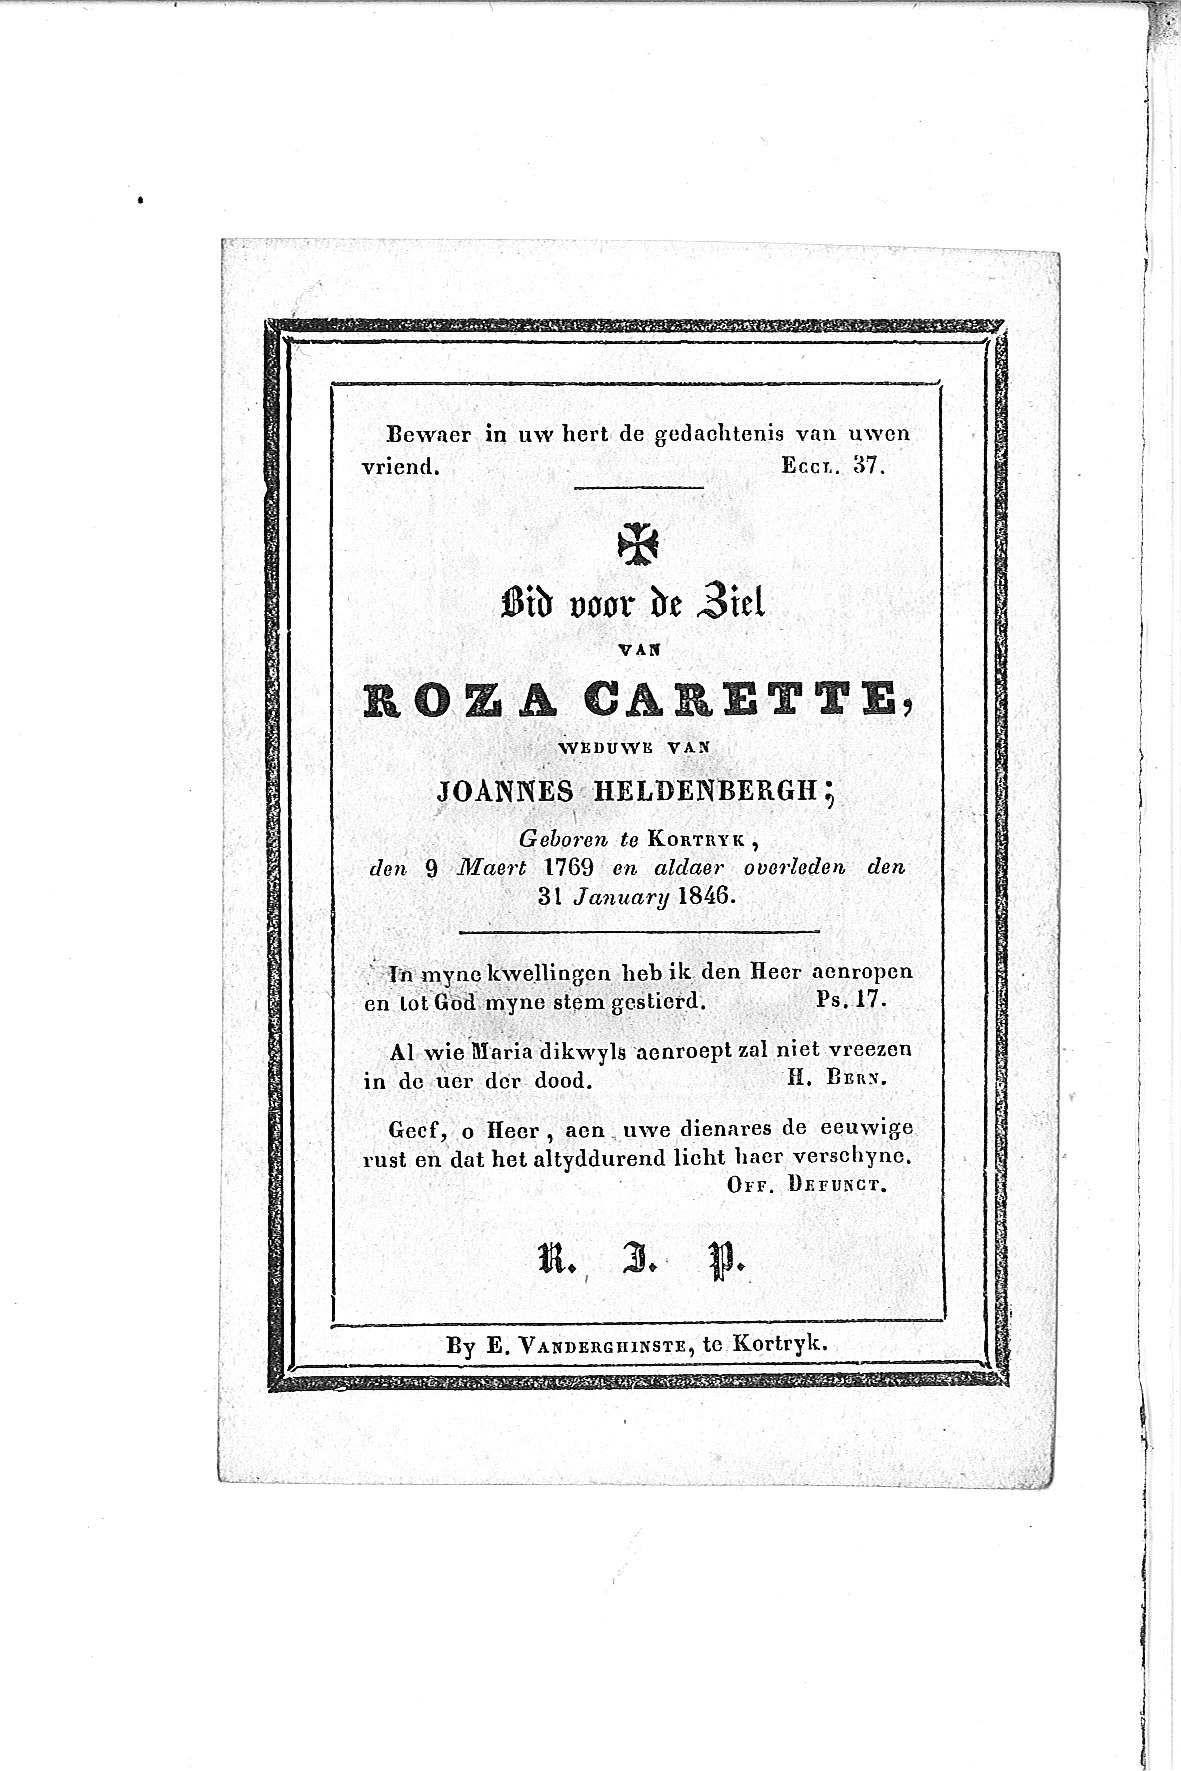 roza(1846)20110120091529_00032.jpg